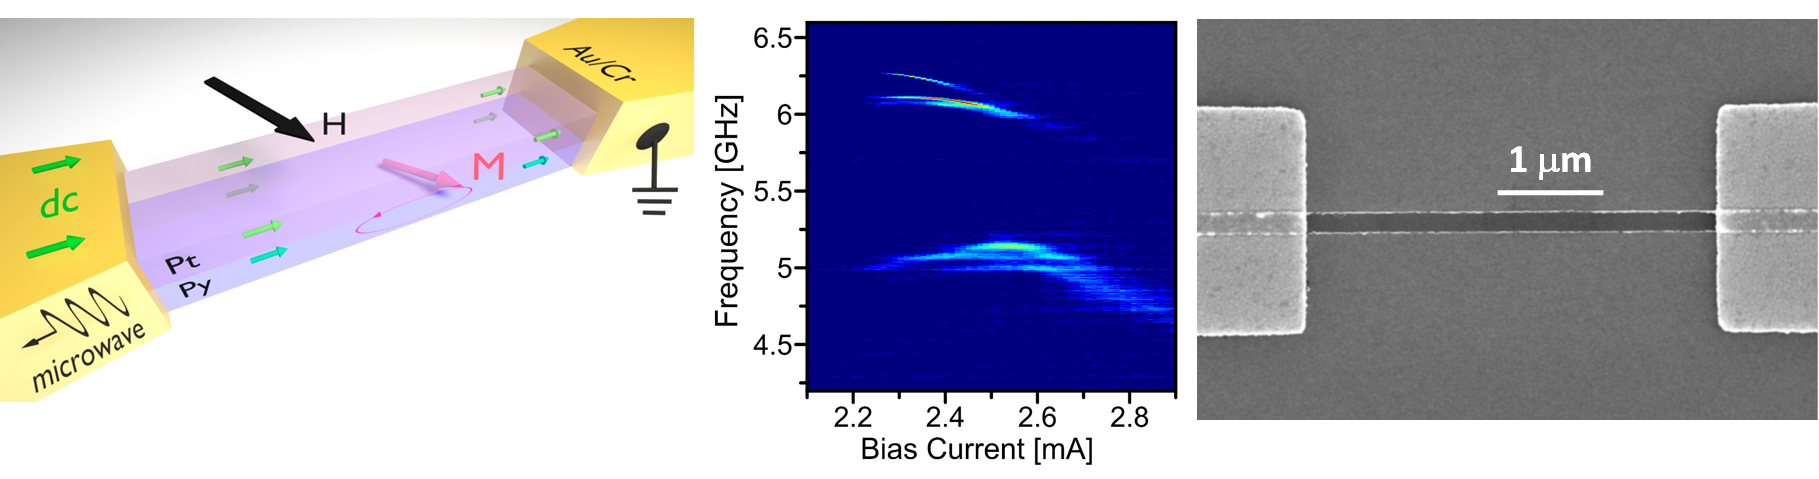 Spin-orbit torques